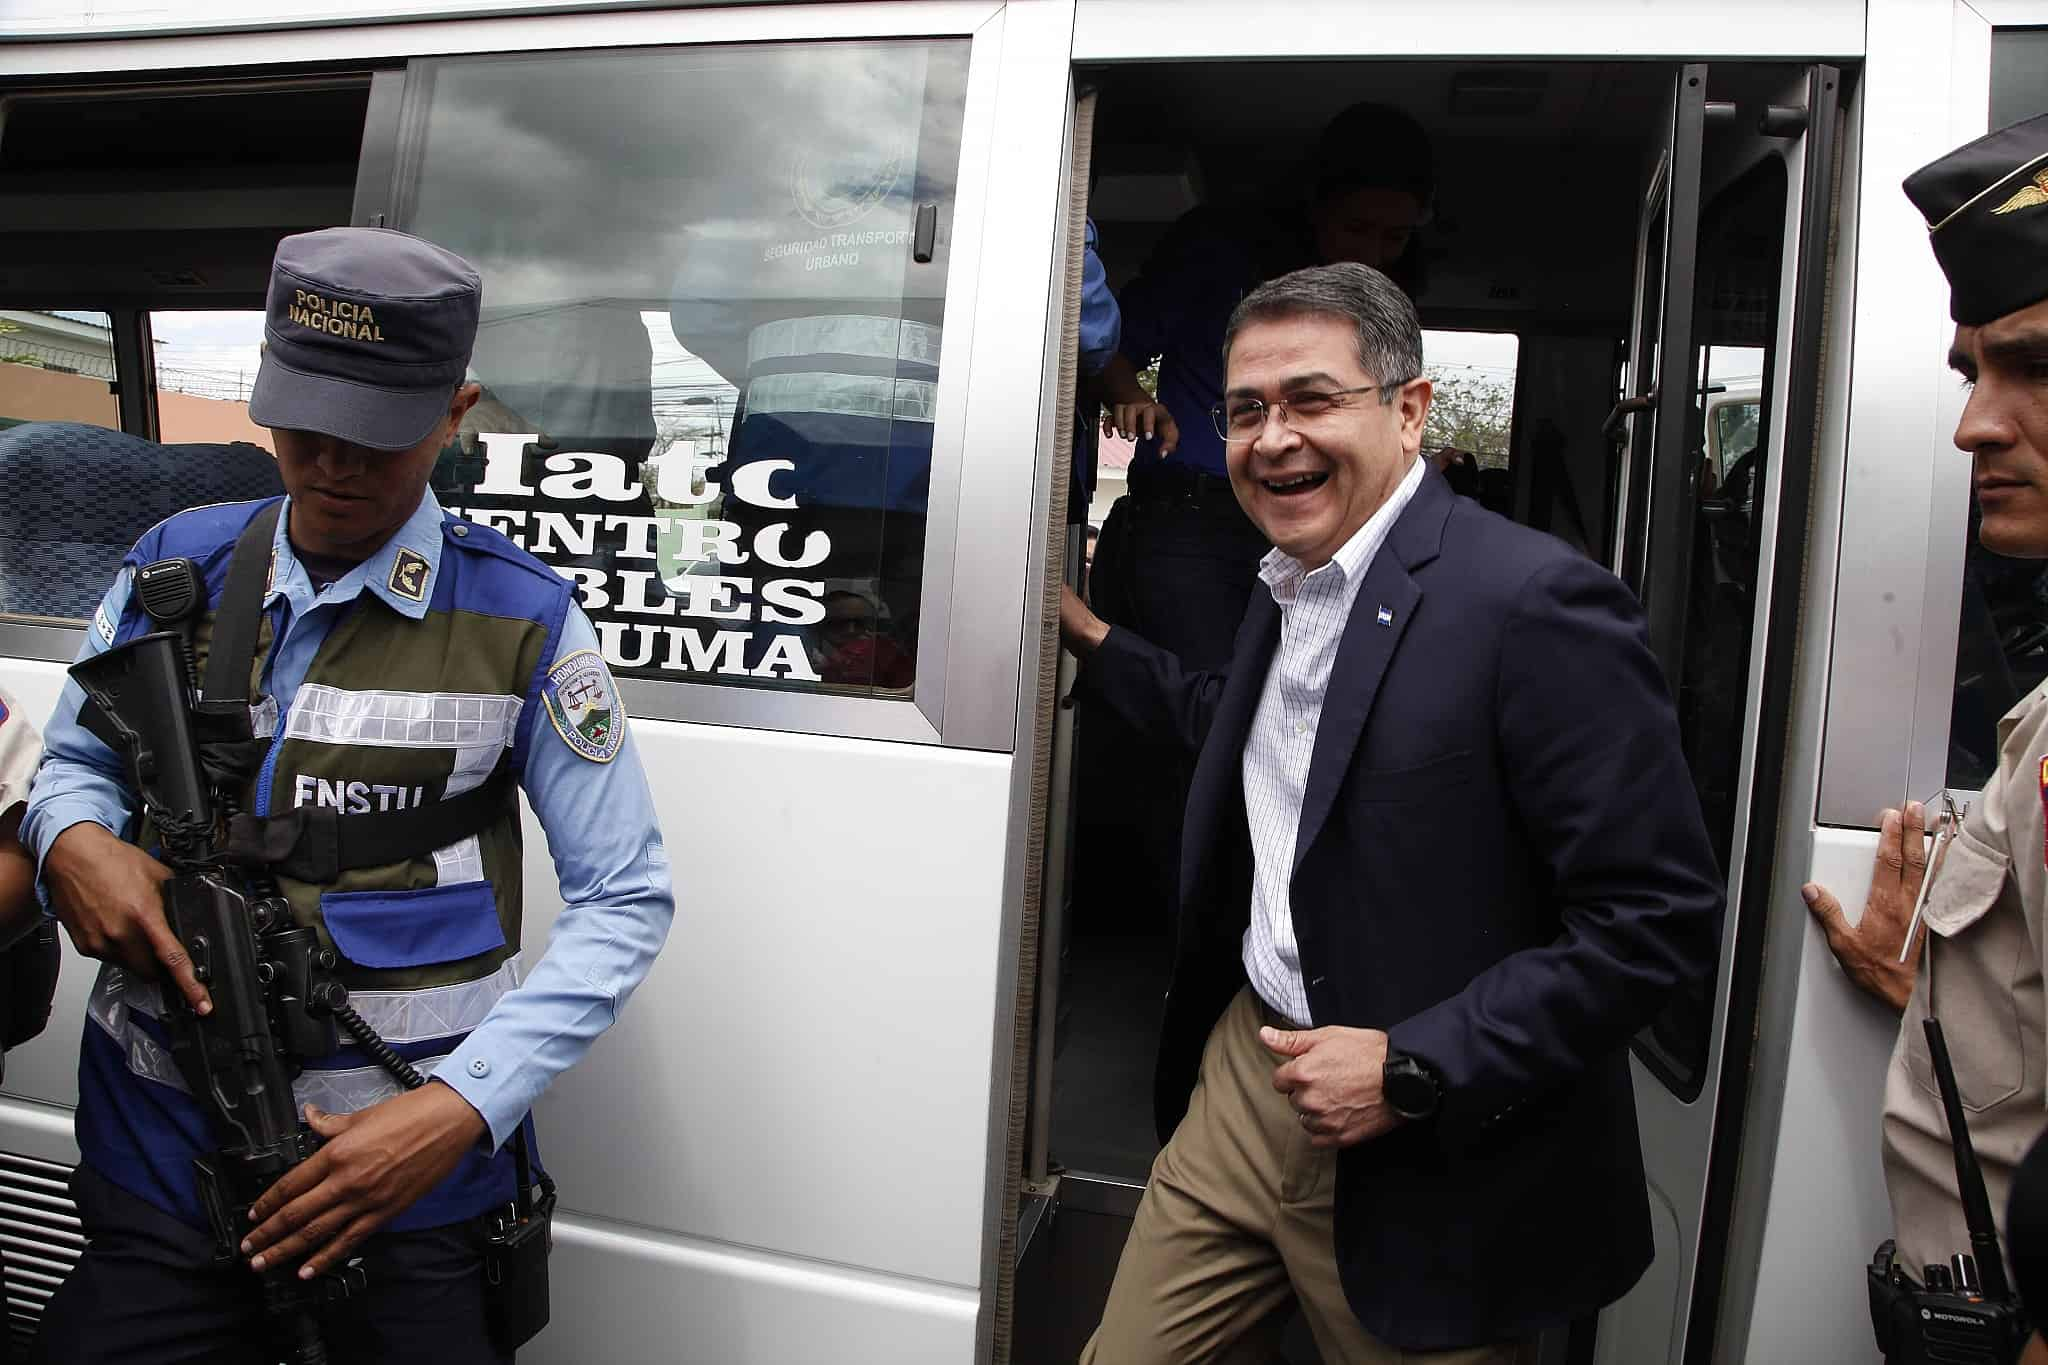 נשיא הונדורס חואן הרננדס (צילום: AP Photo/Fernando Antonio)